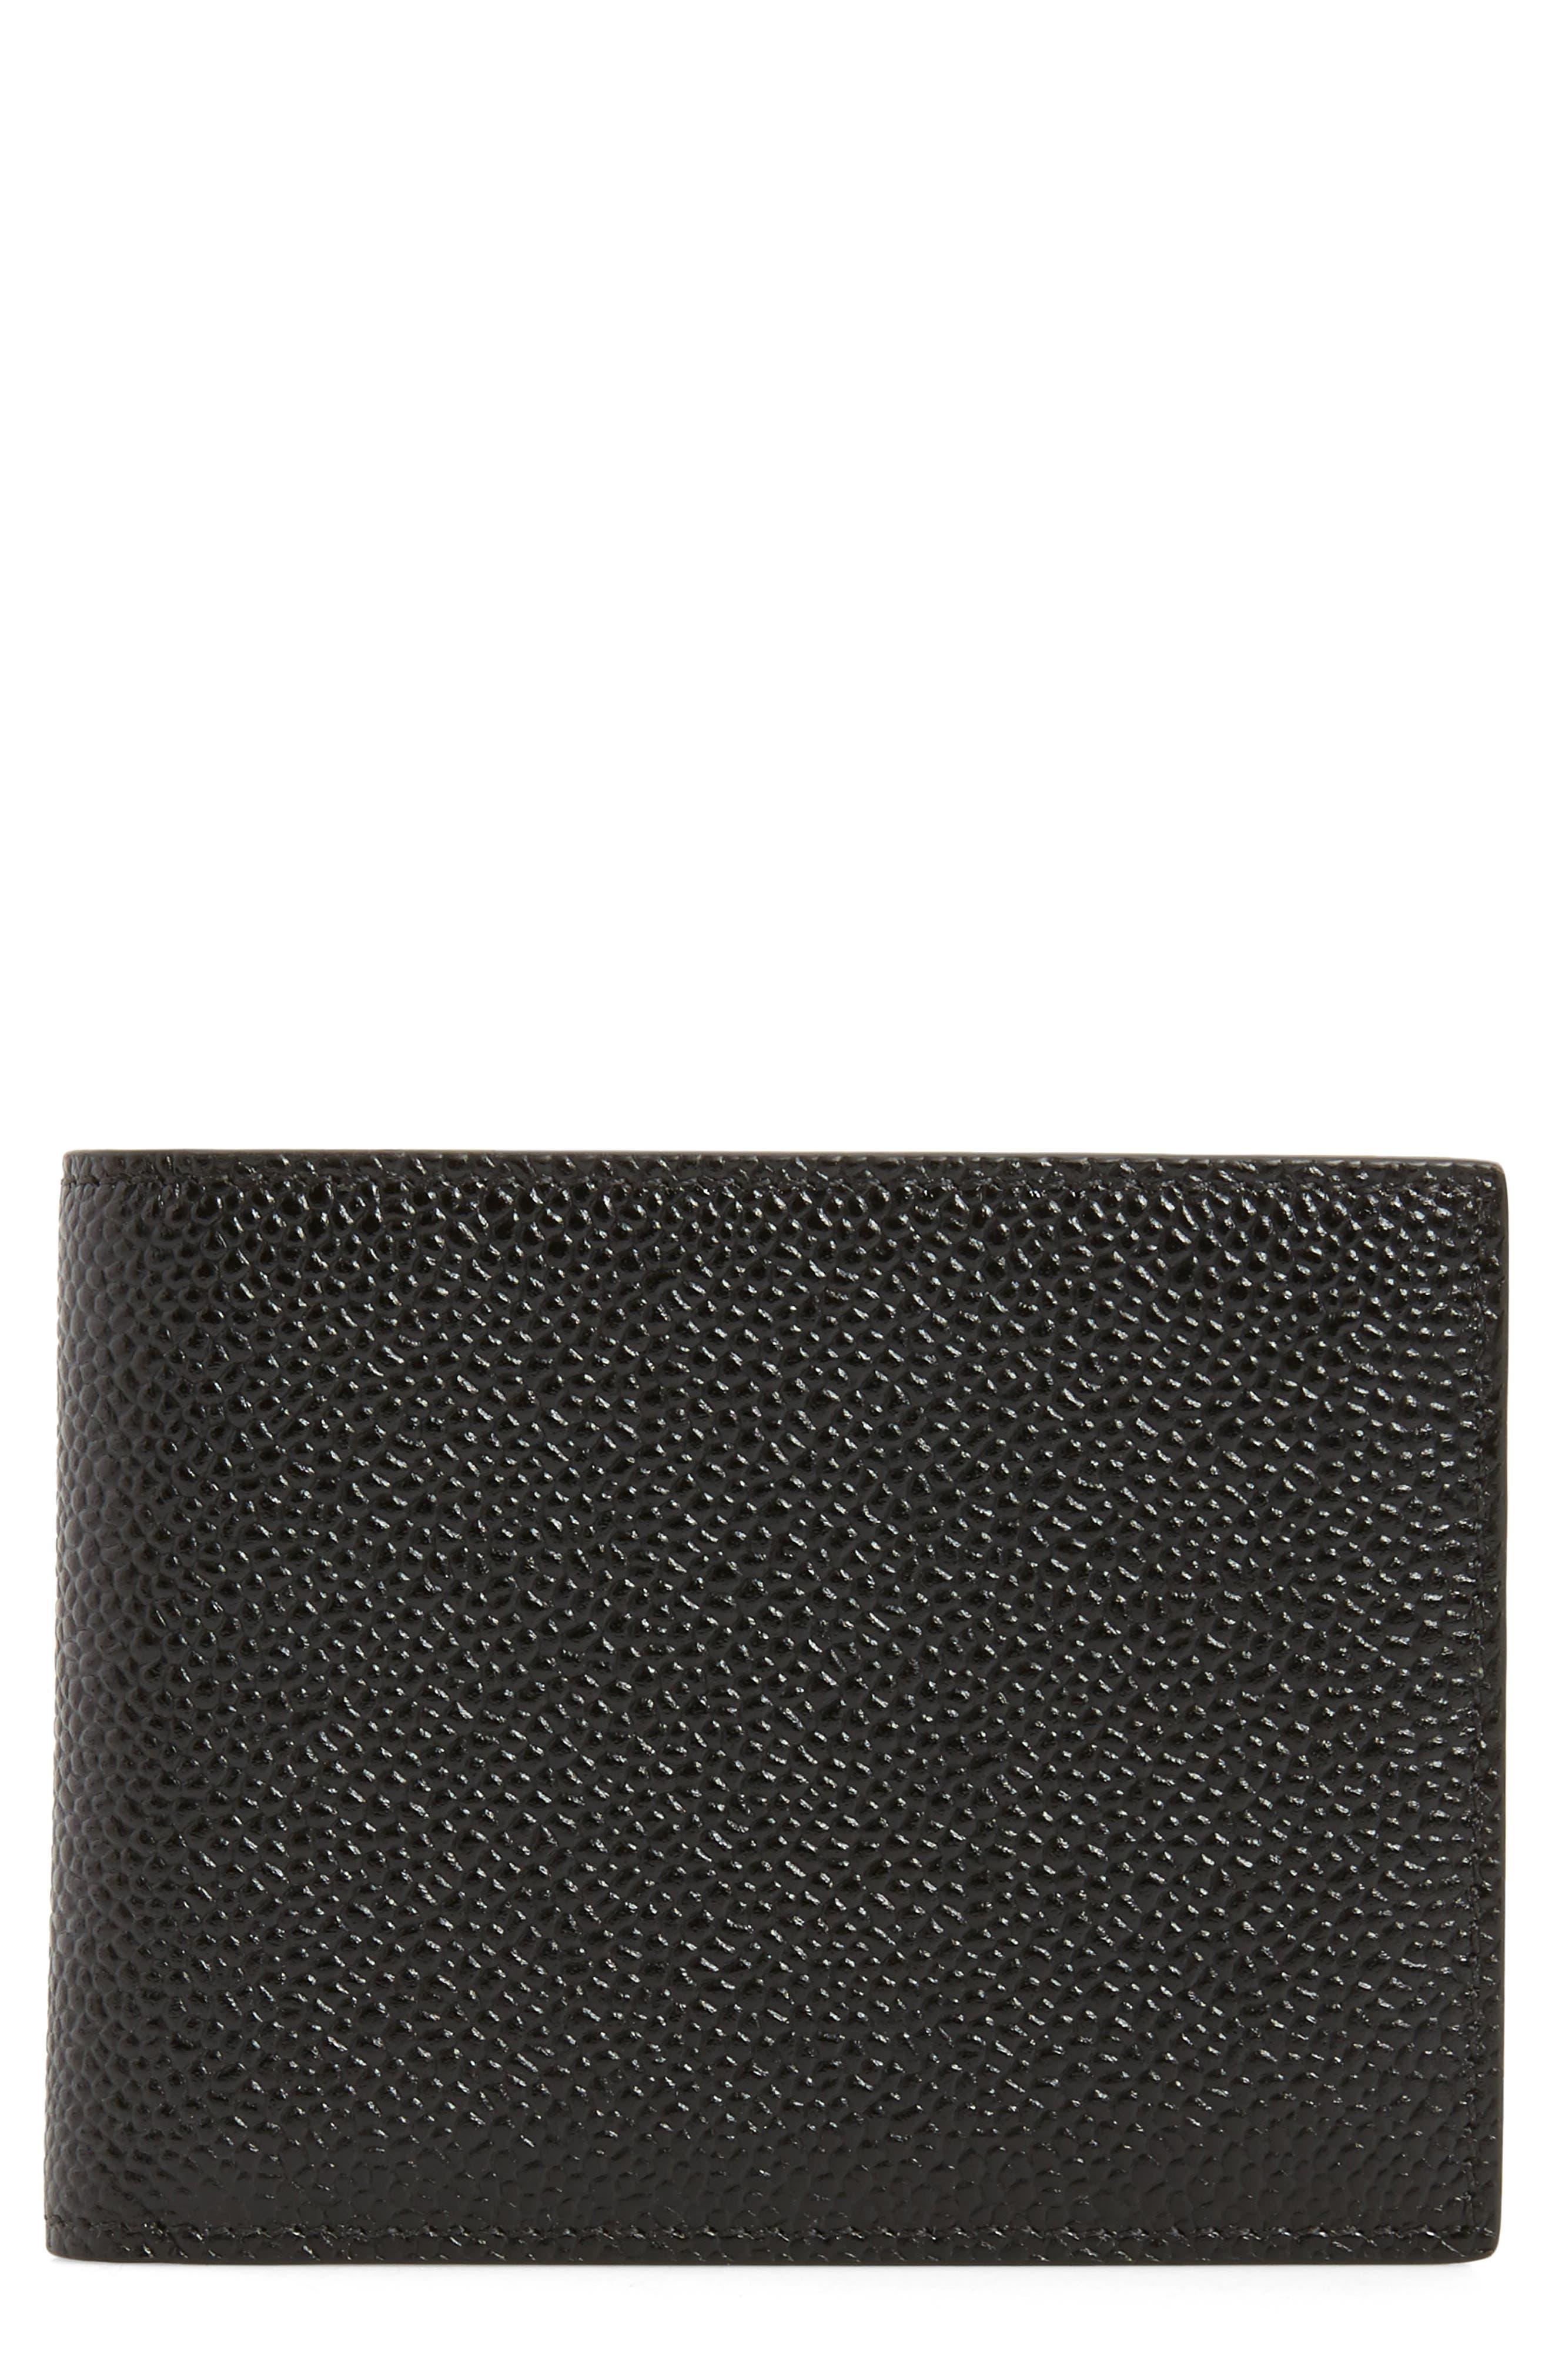 Thom Browne Pebble Grain Leather Wallet